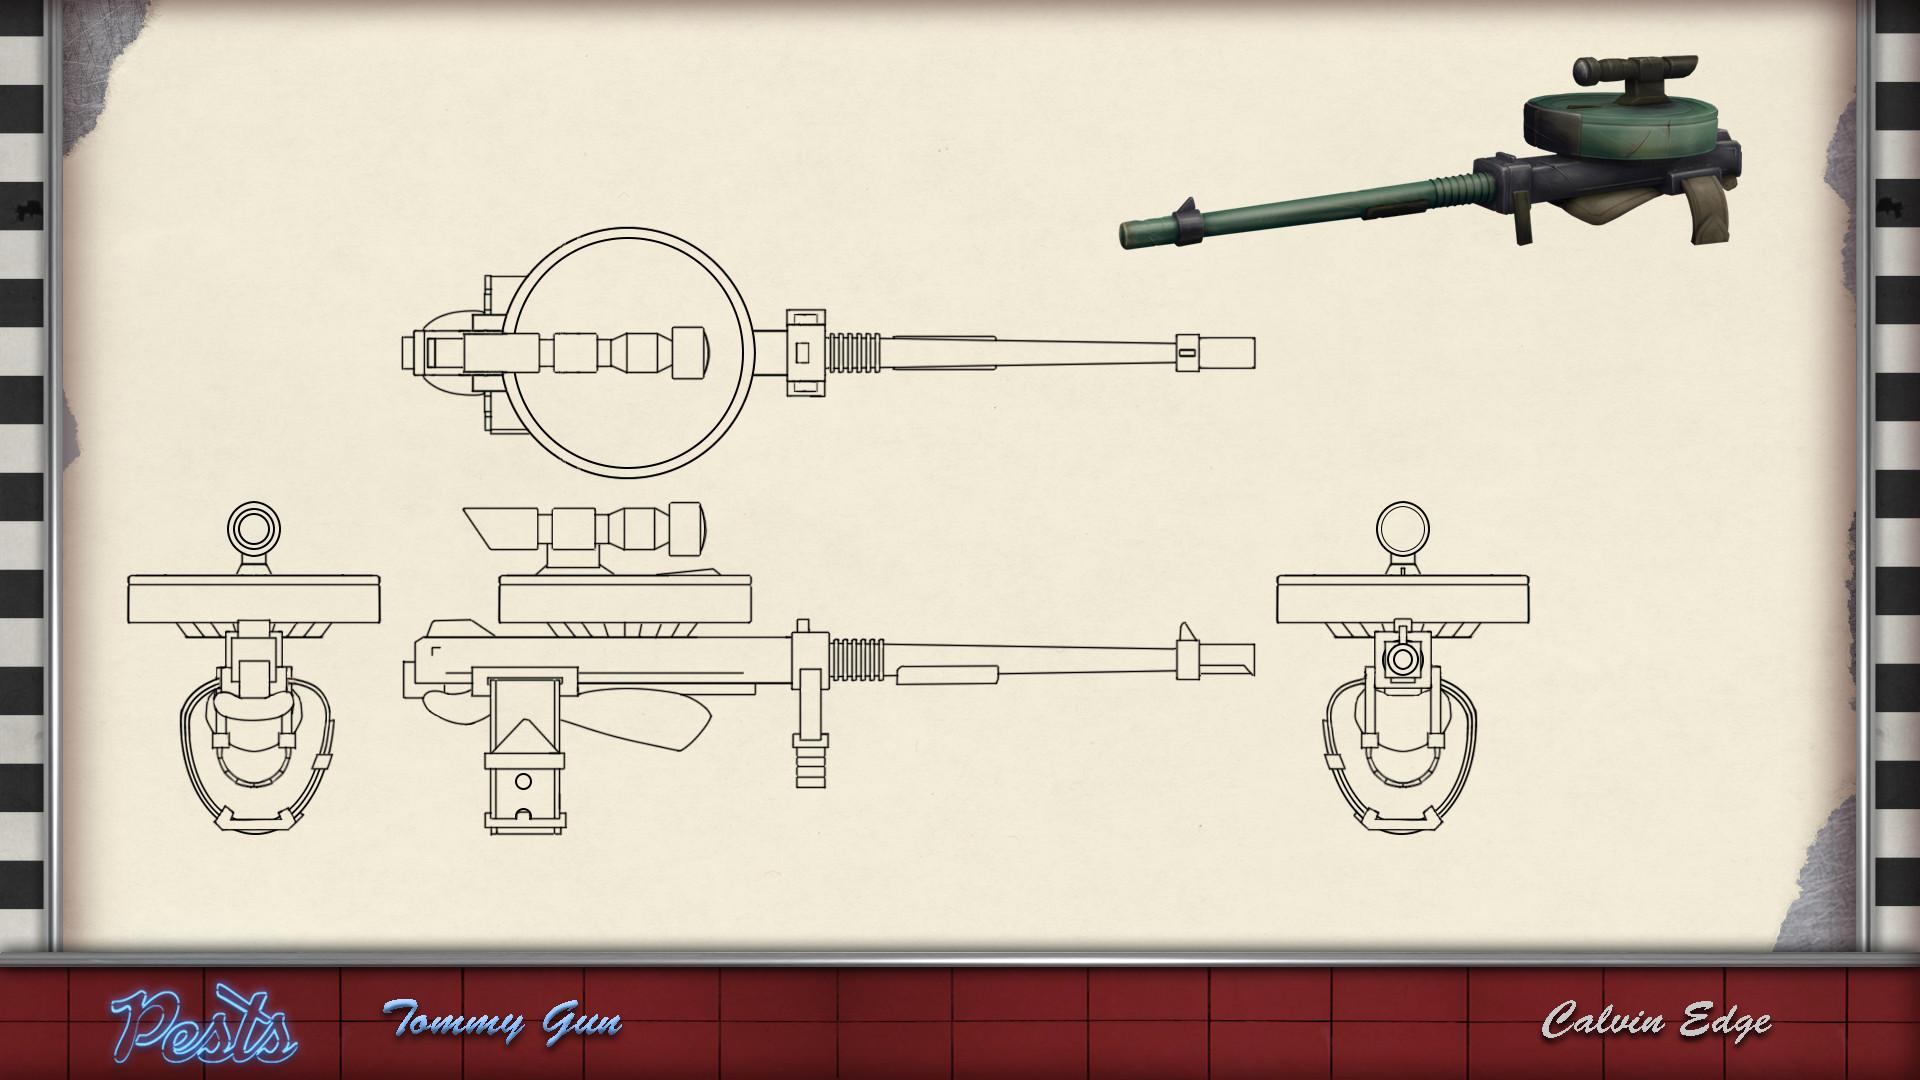 ArtStation - Tommy gun, Calvin Edge